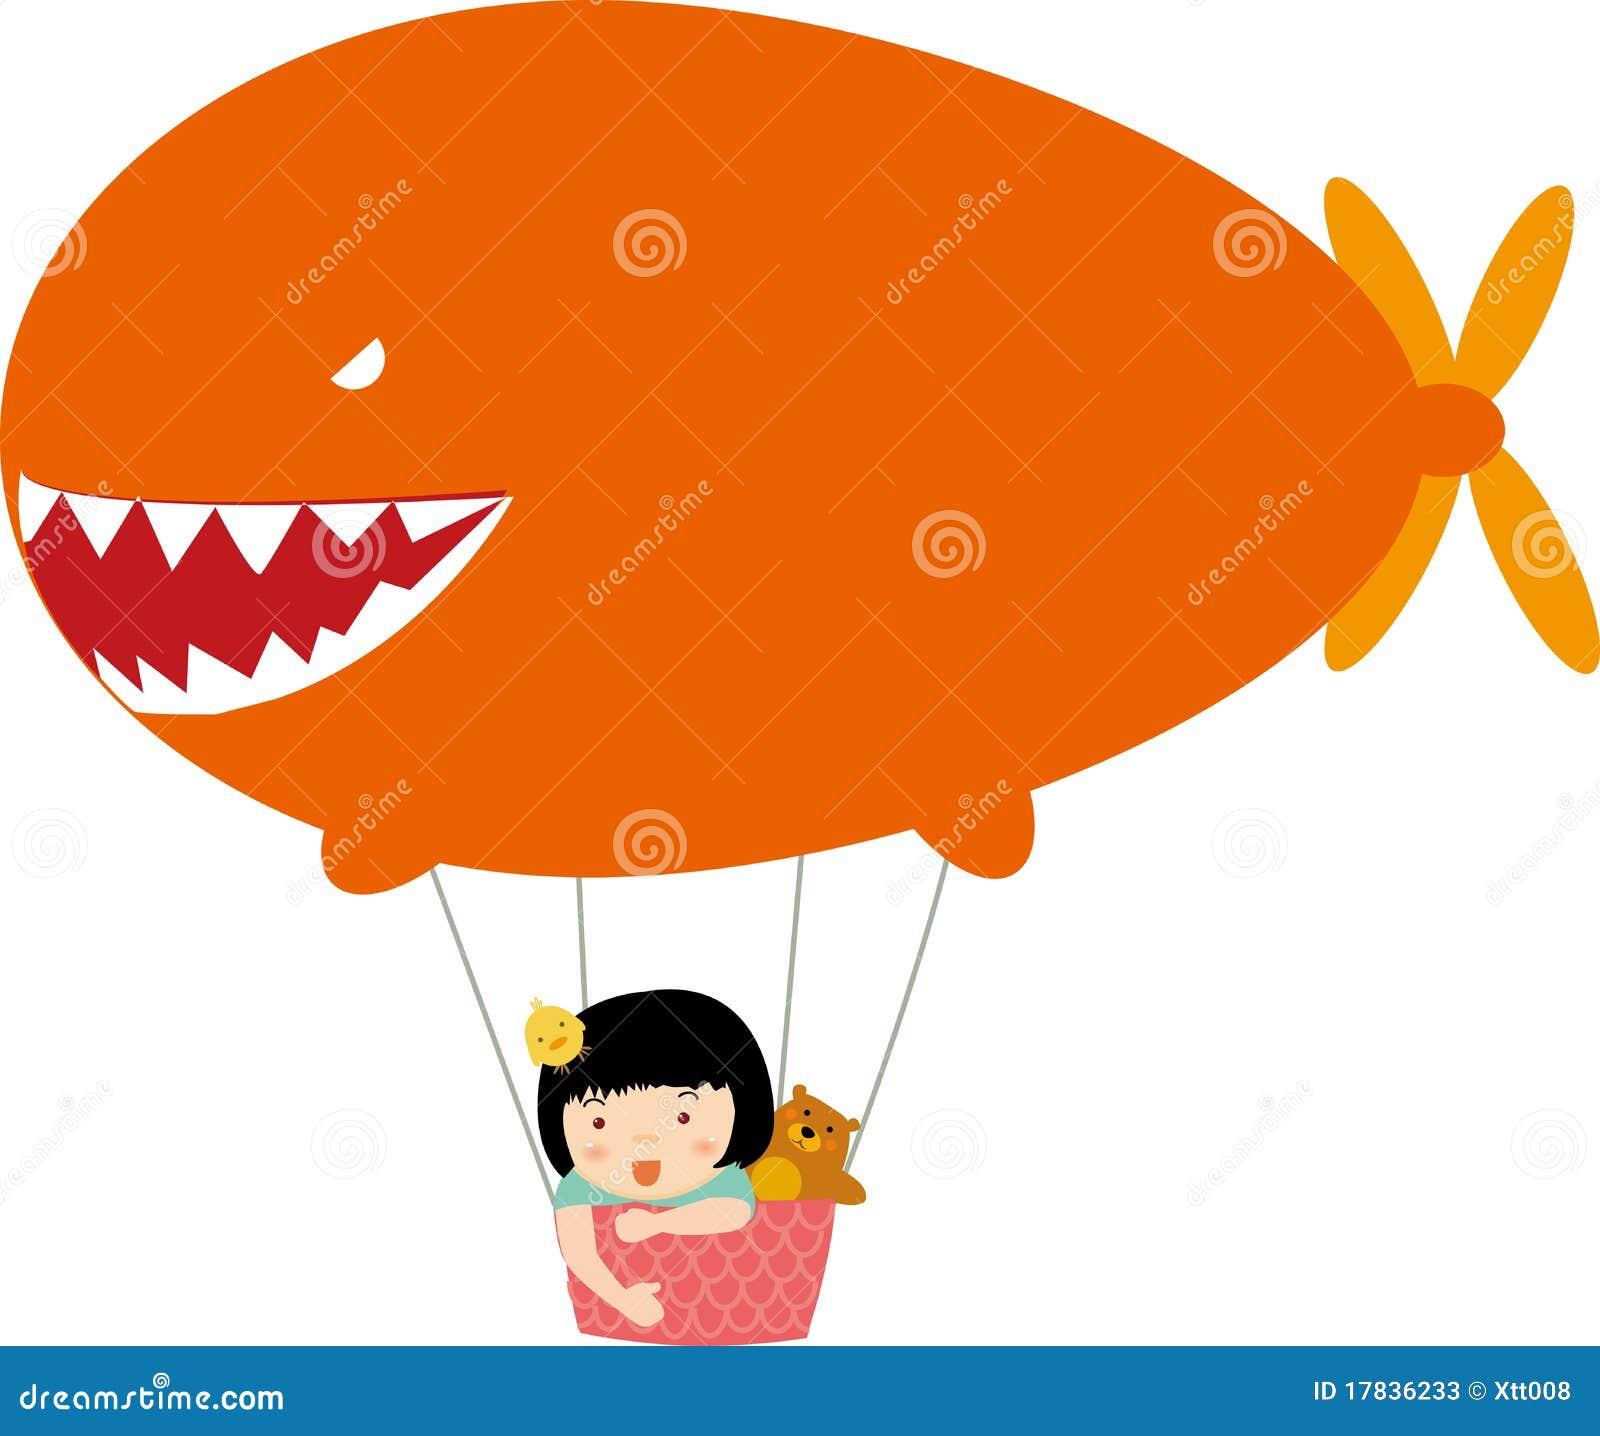 Children And Hot Air Balloon Stock Vector - Illustration ...